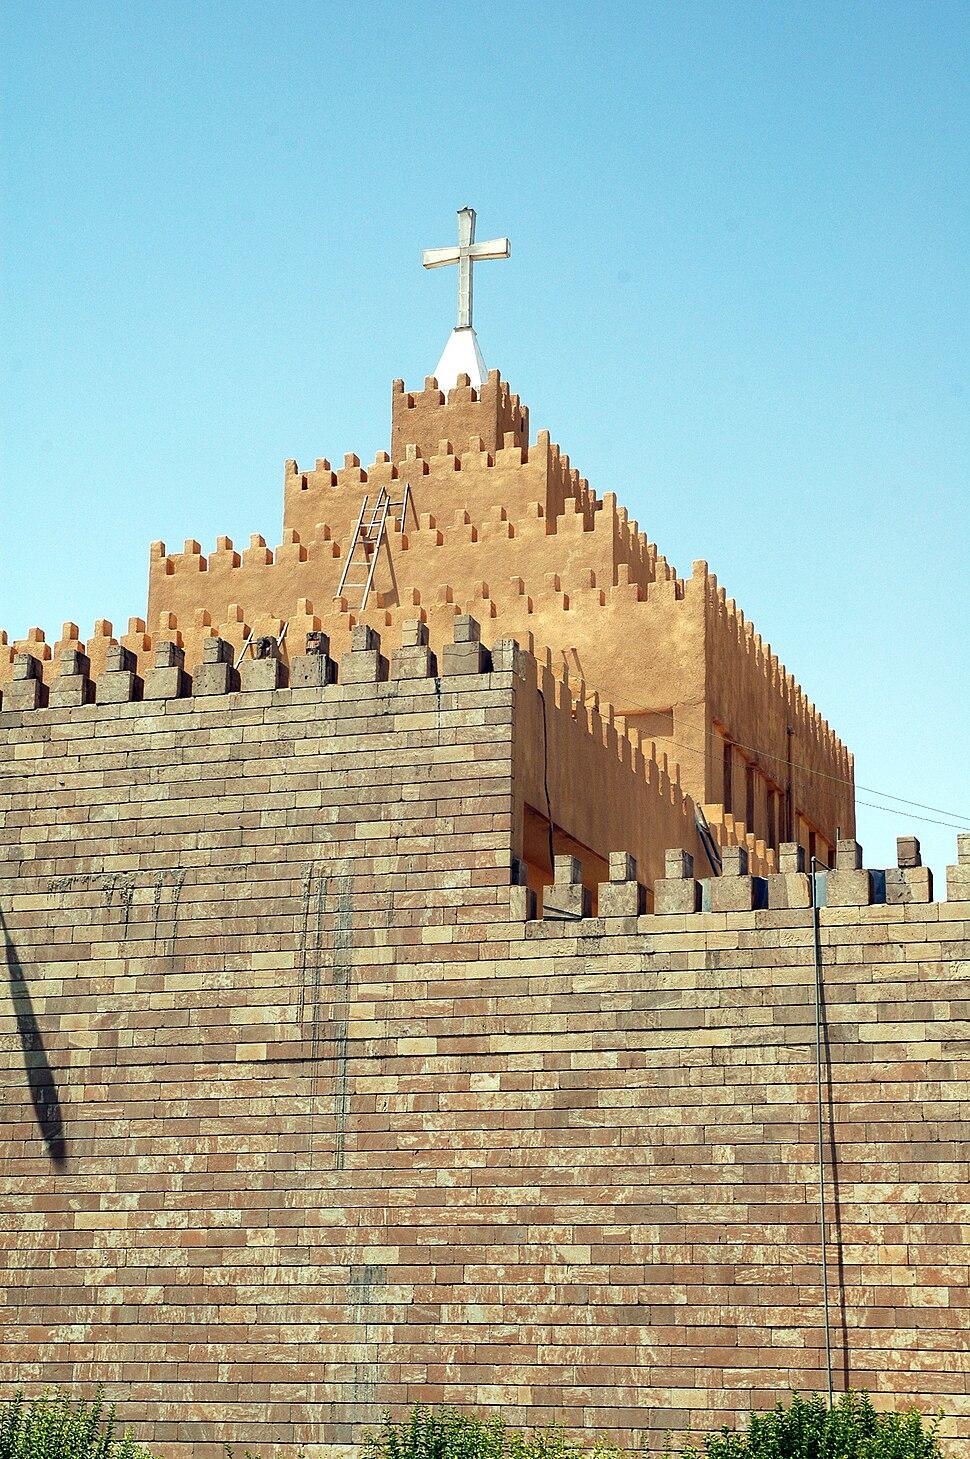 Chaldean Catholic Cathedral of Saint Joseph 2005 (Ankawa, Erbil, Iraq)